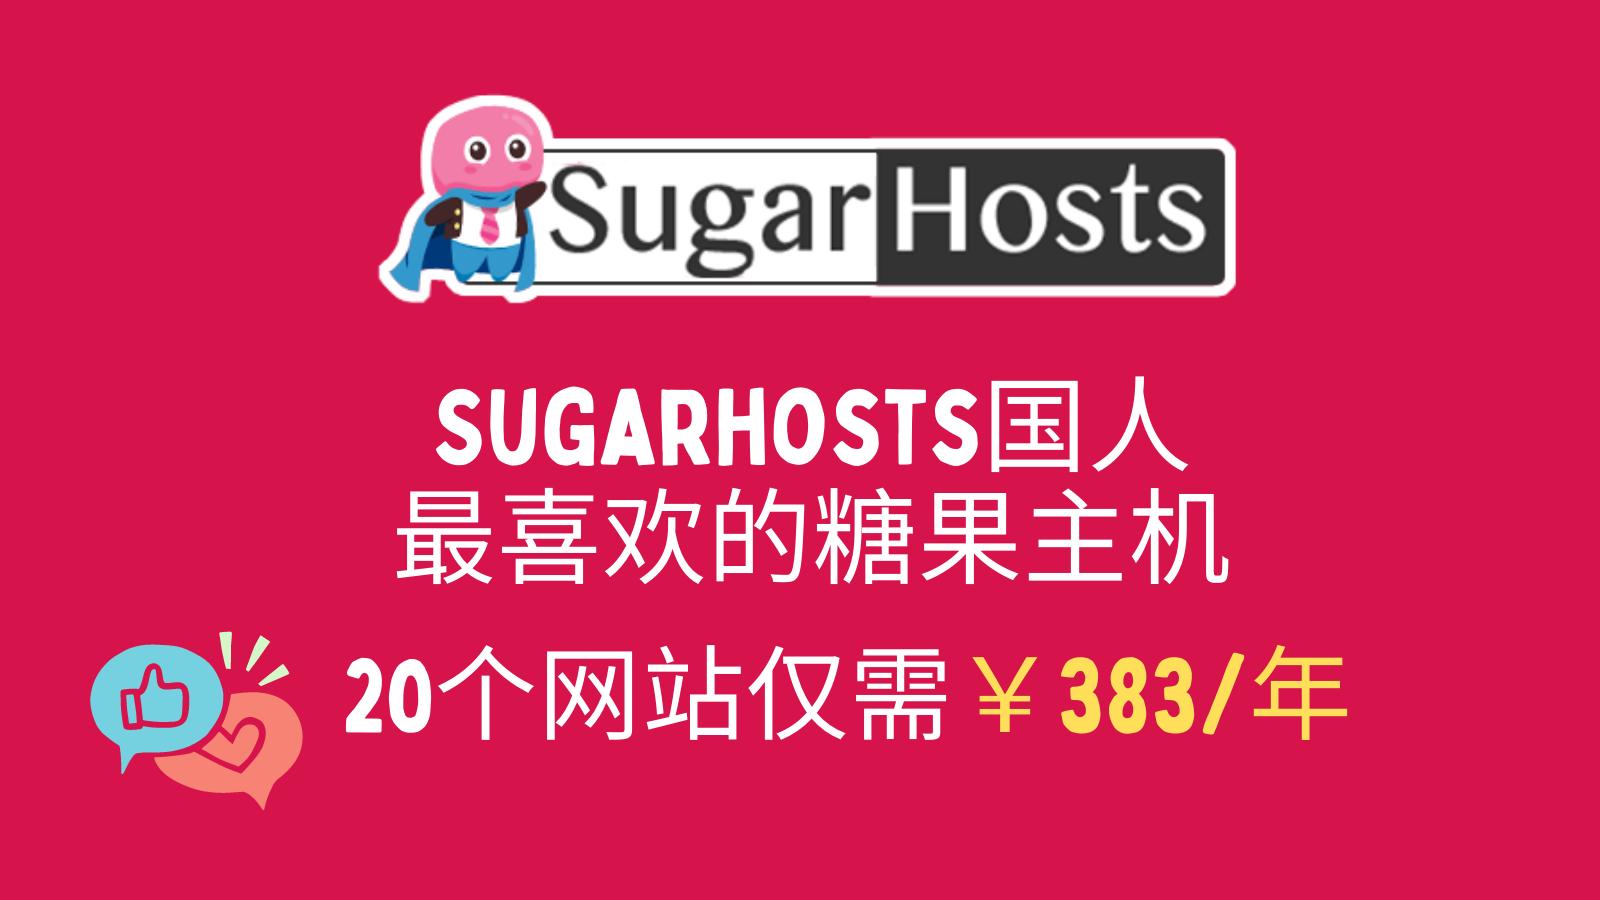 Sugarhosts国人最喜欢的糖果主机